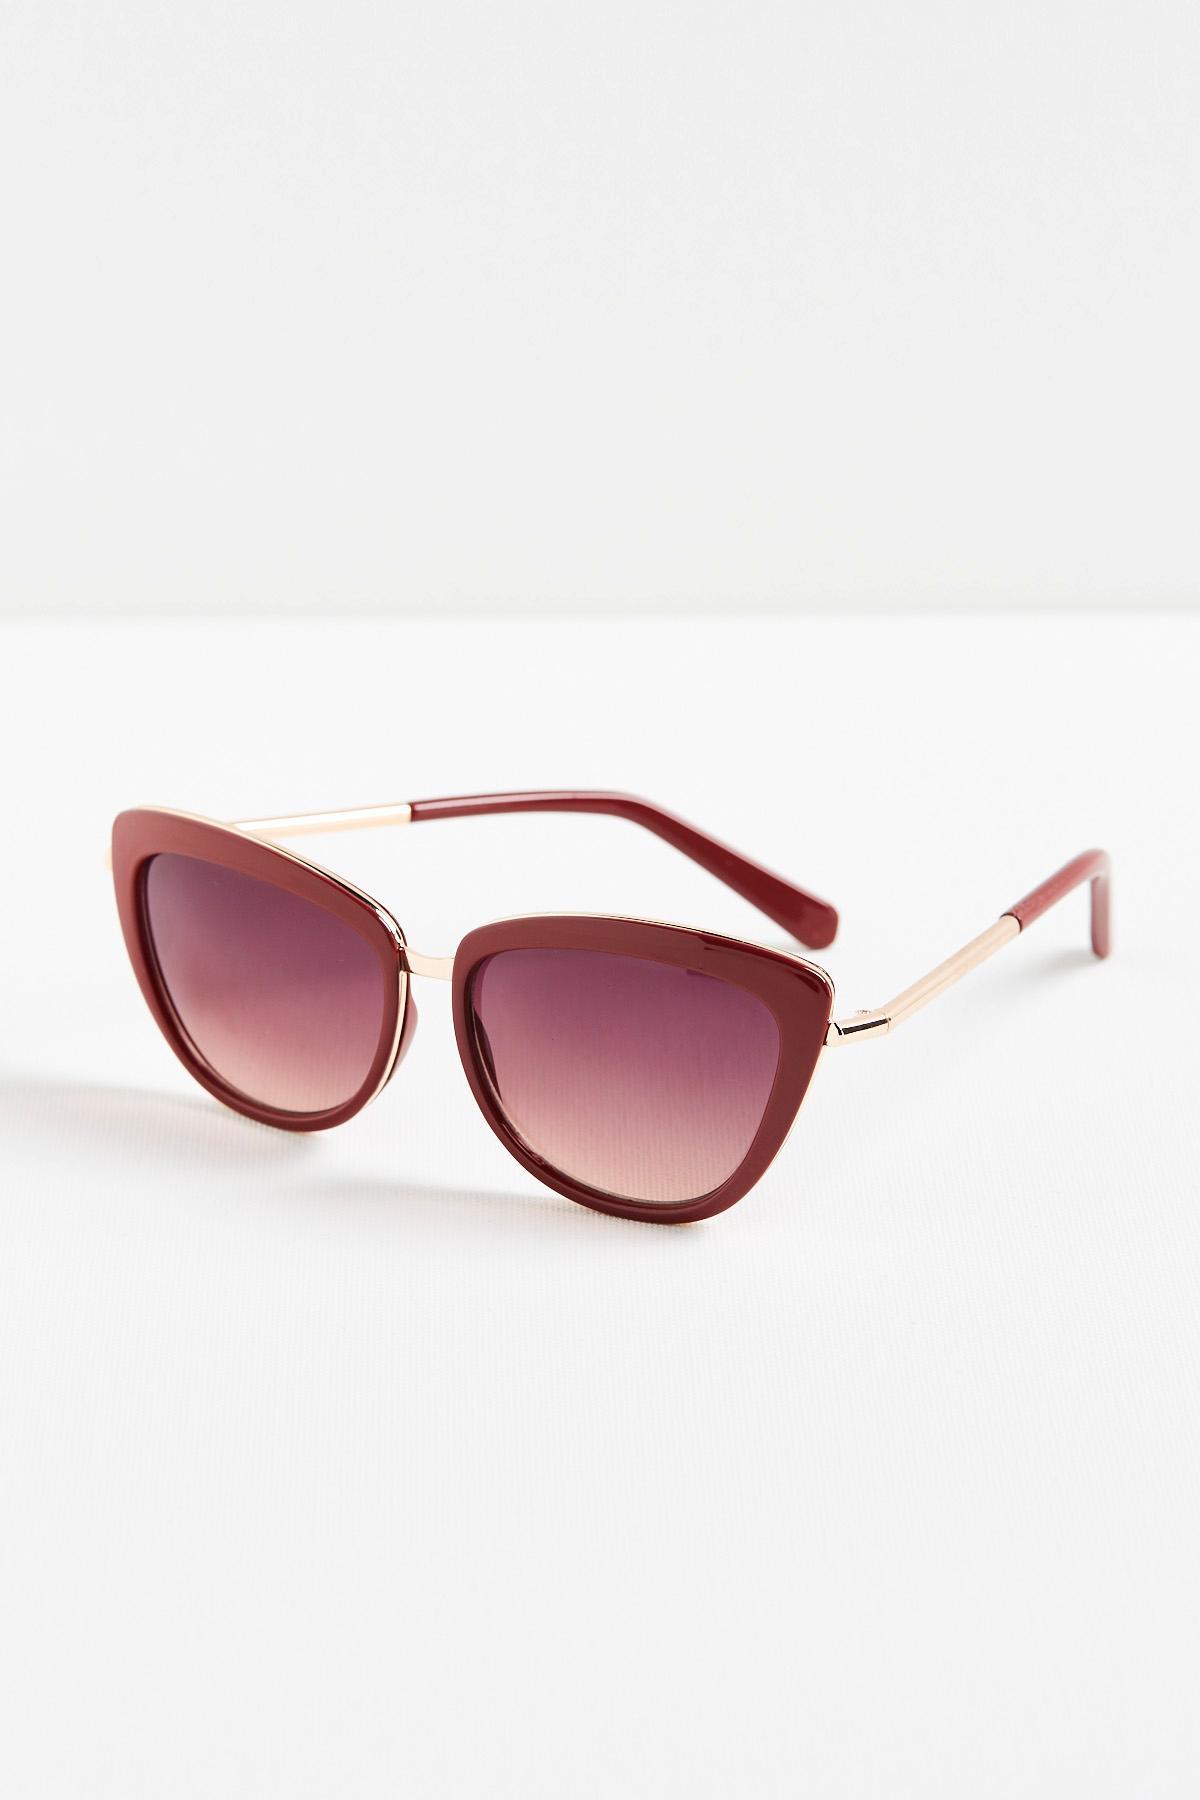 Mod Cateye Sunglasses